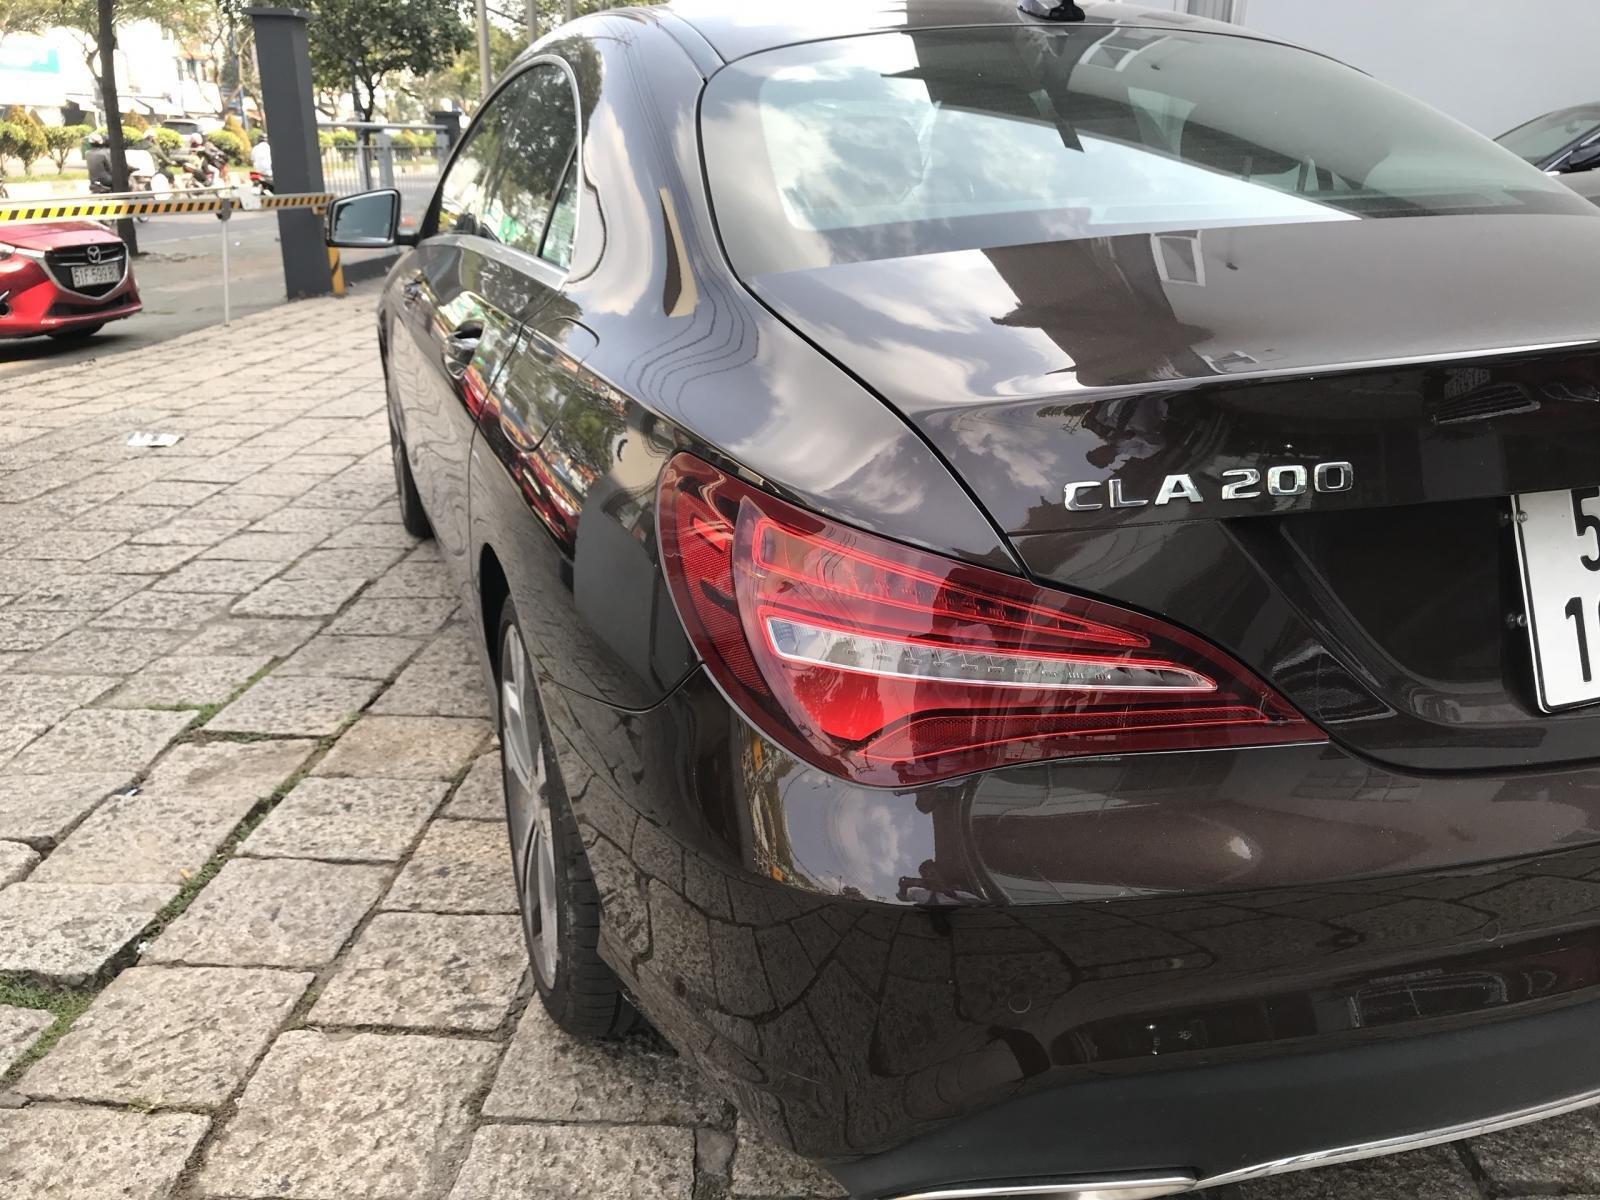 Bán xe Mercedes CLA200 lướt 2000 km, ĐK 6/2018 (5)